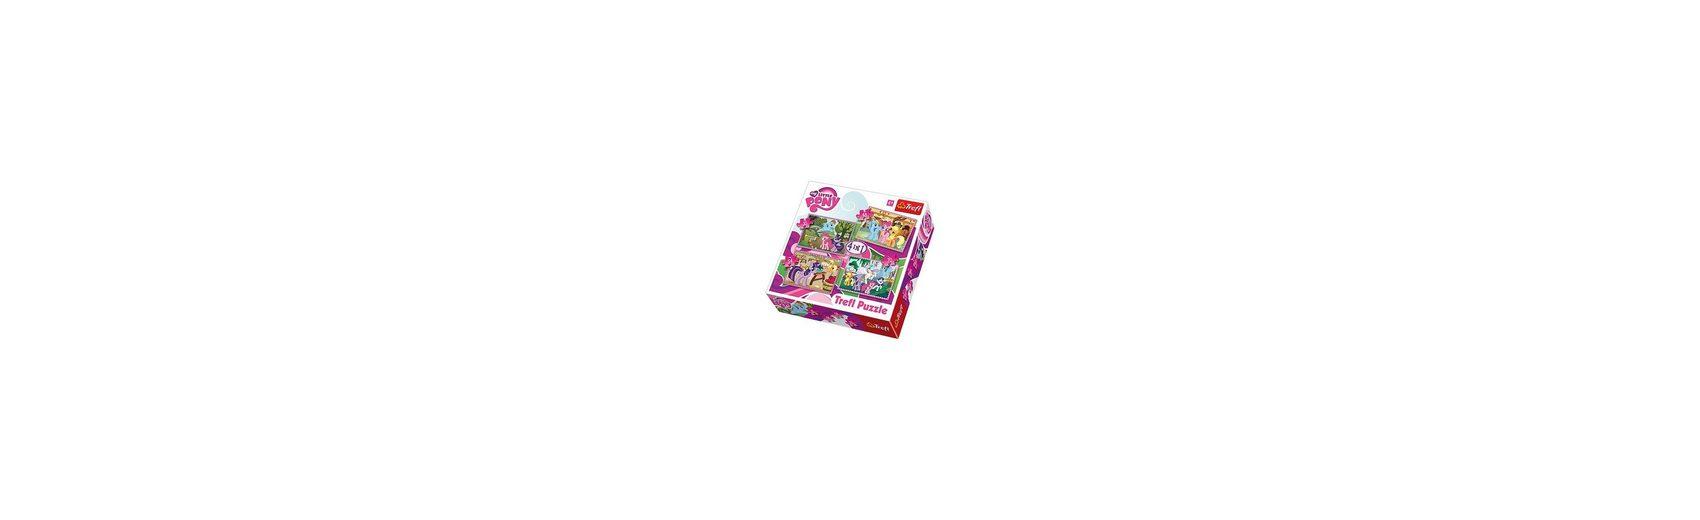 Trefl Puzzle-Set 4in1 - 35/48/54/70 Teile - My little Pony